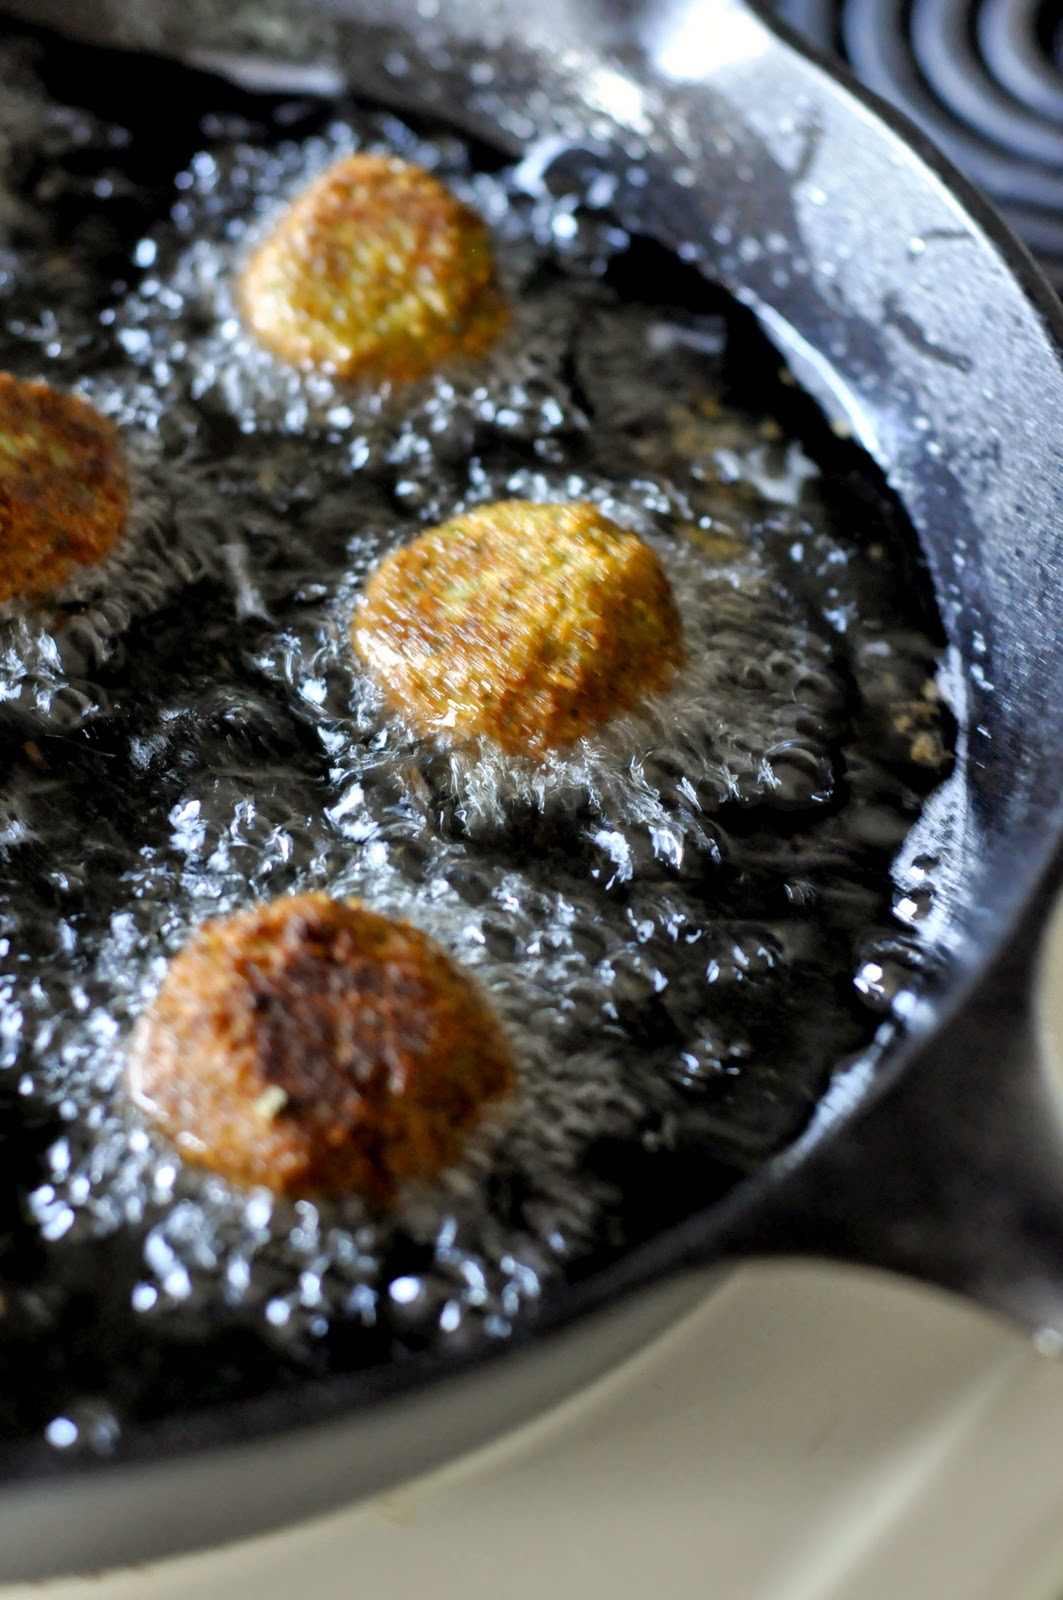 Frying-Homemade-Falafel-tasteasyougo.com